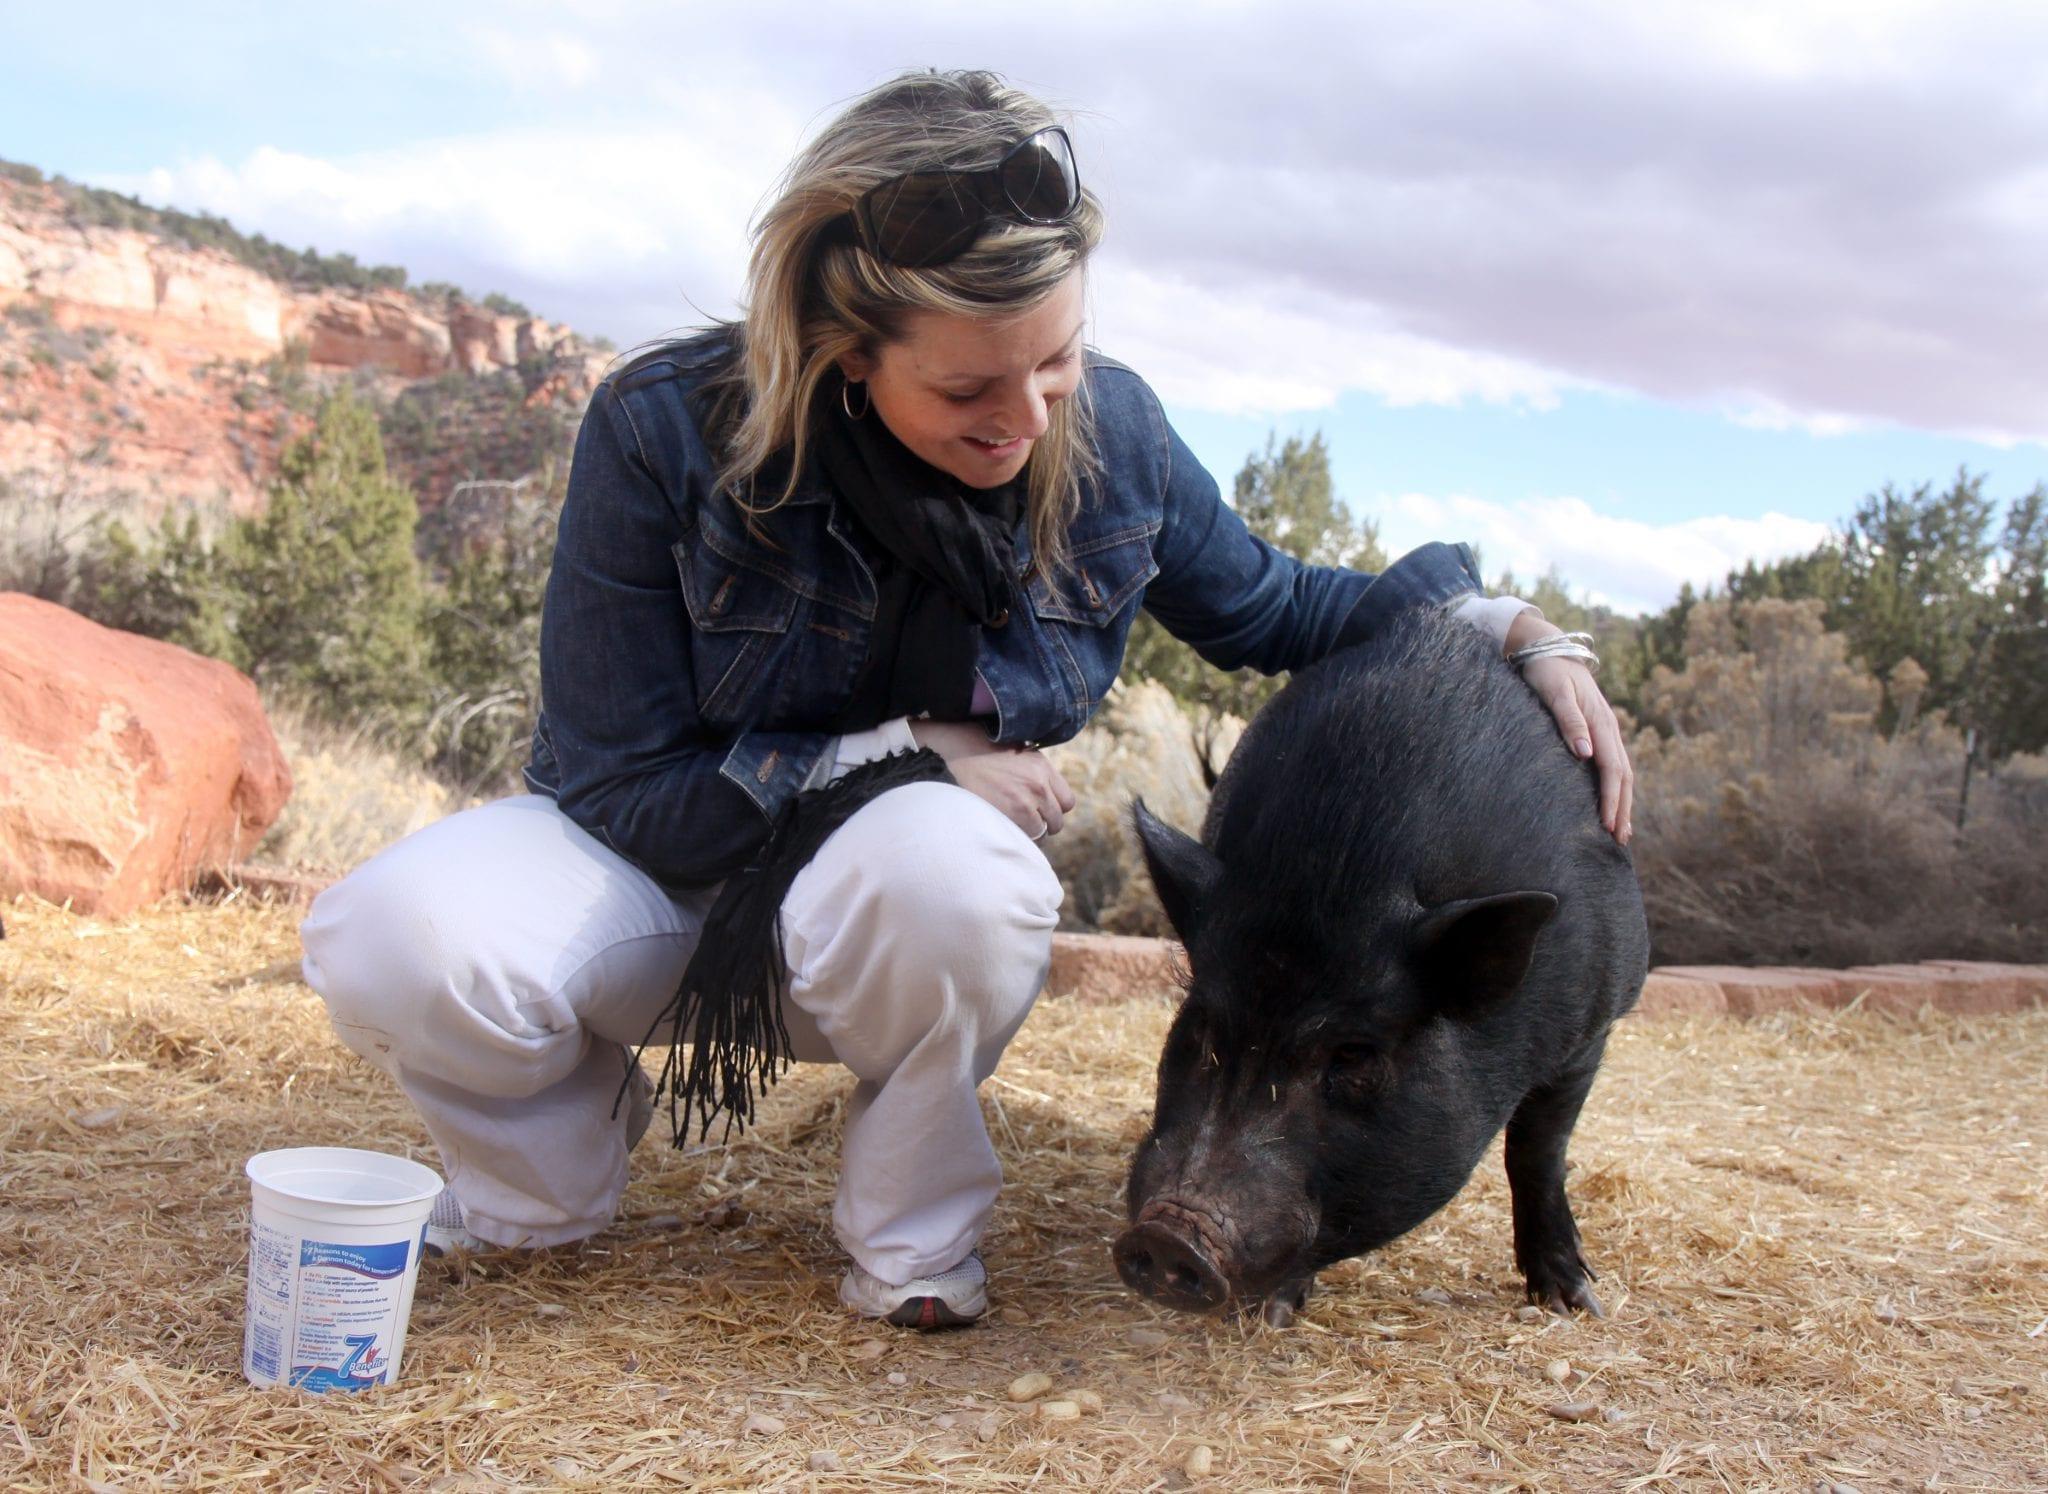 Me and a pal, Best Friends Magazine, Best Friends Animal Society: Kanab, Utah, 2009.